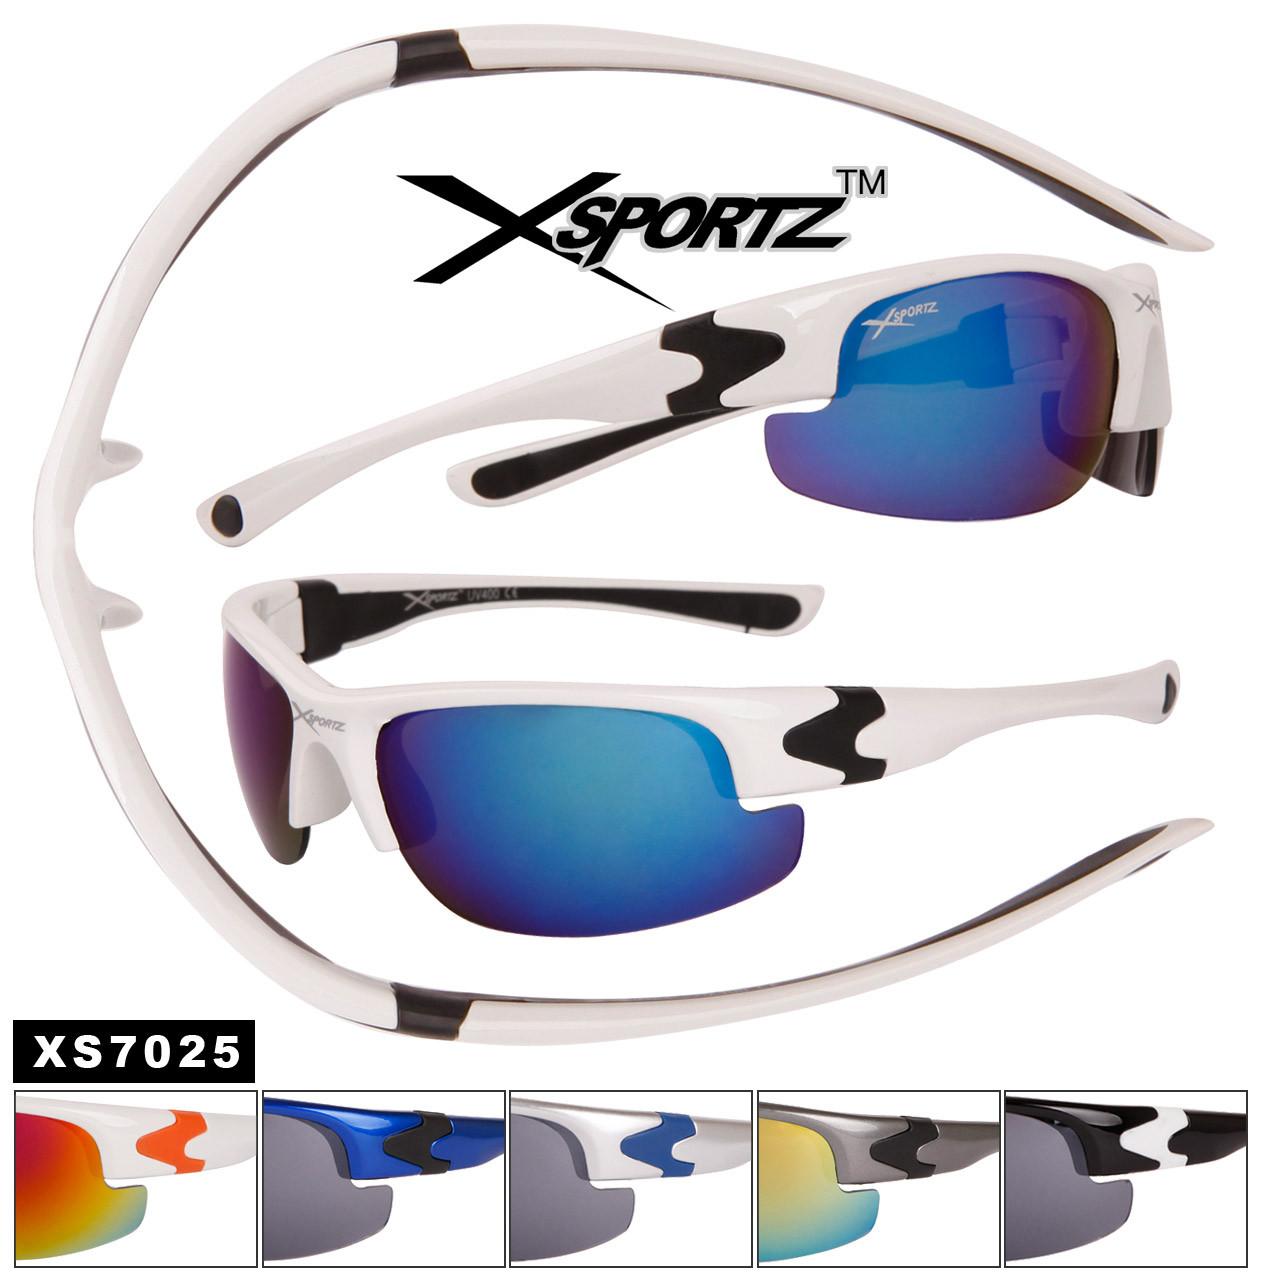 Bulk Sport Sunglasses Xsportz™ - Style #XS7025 (Assorted Colors) (12 pcs.)